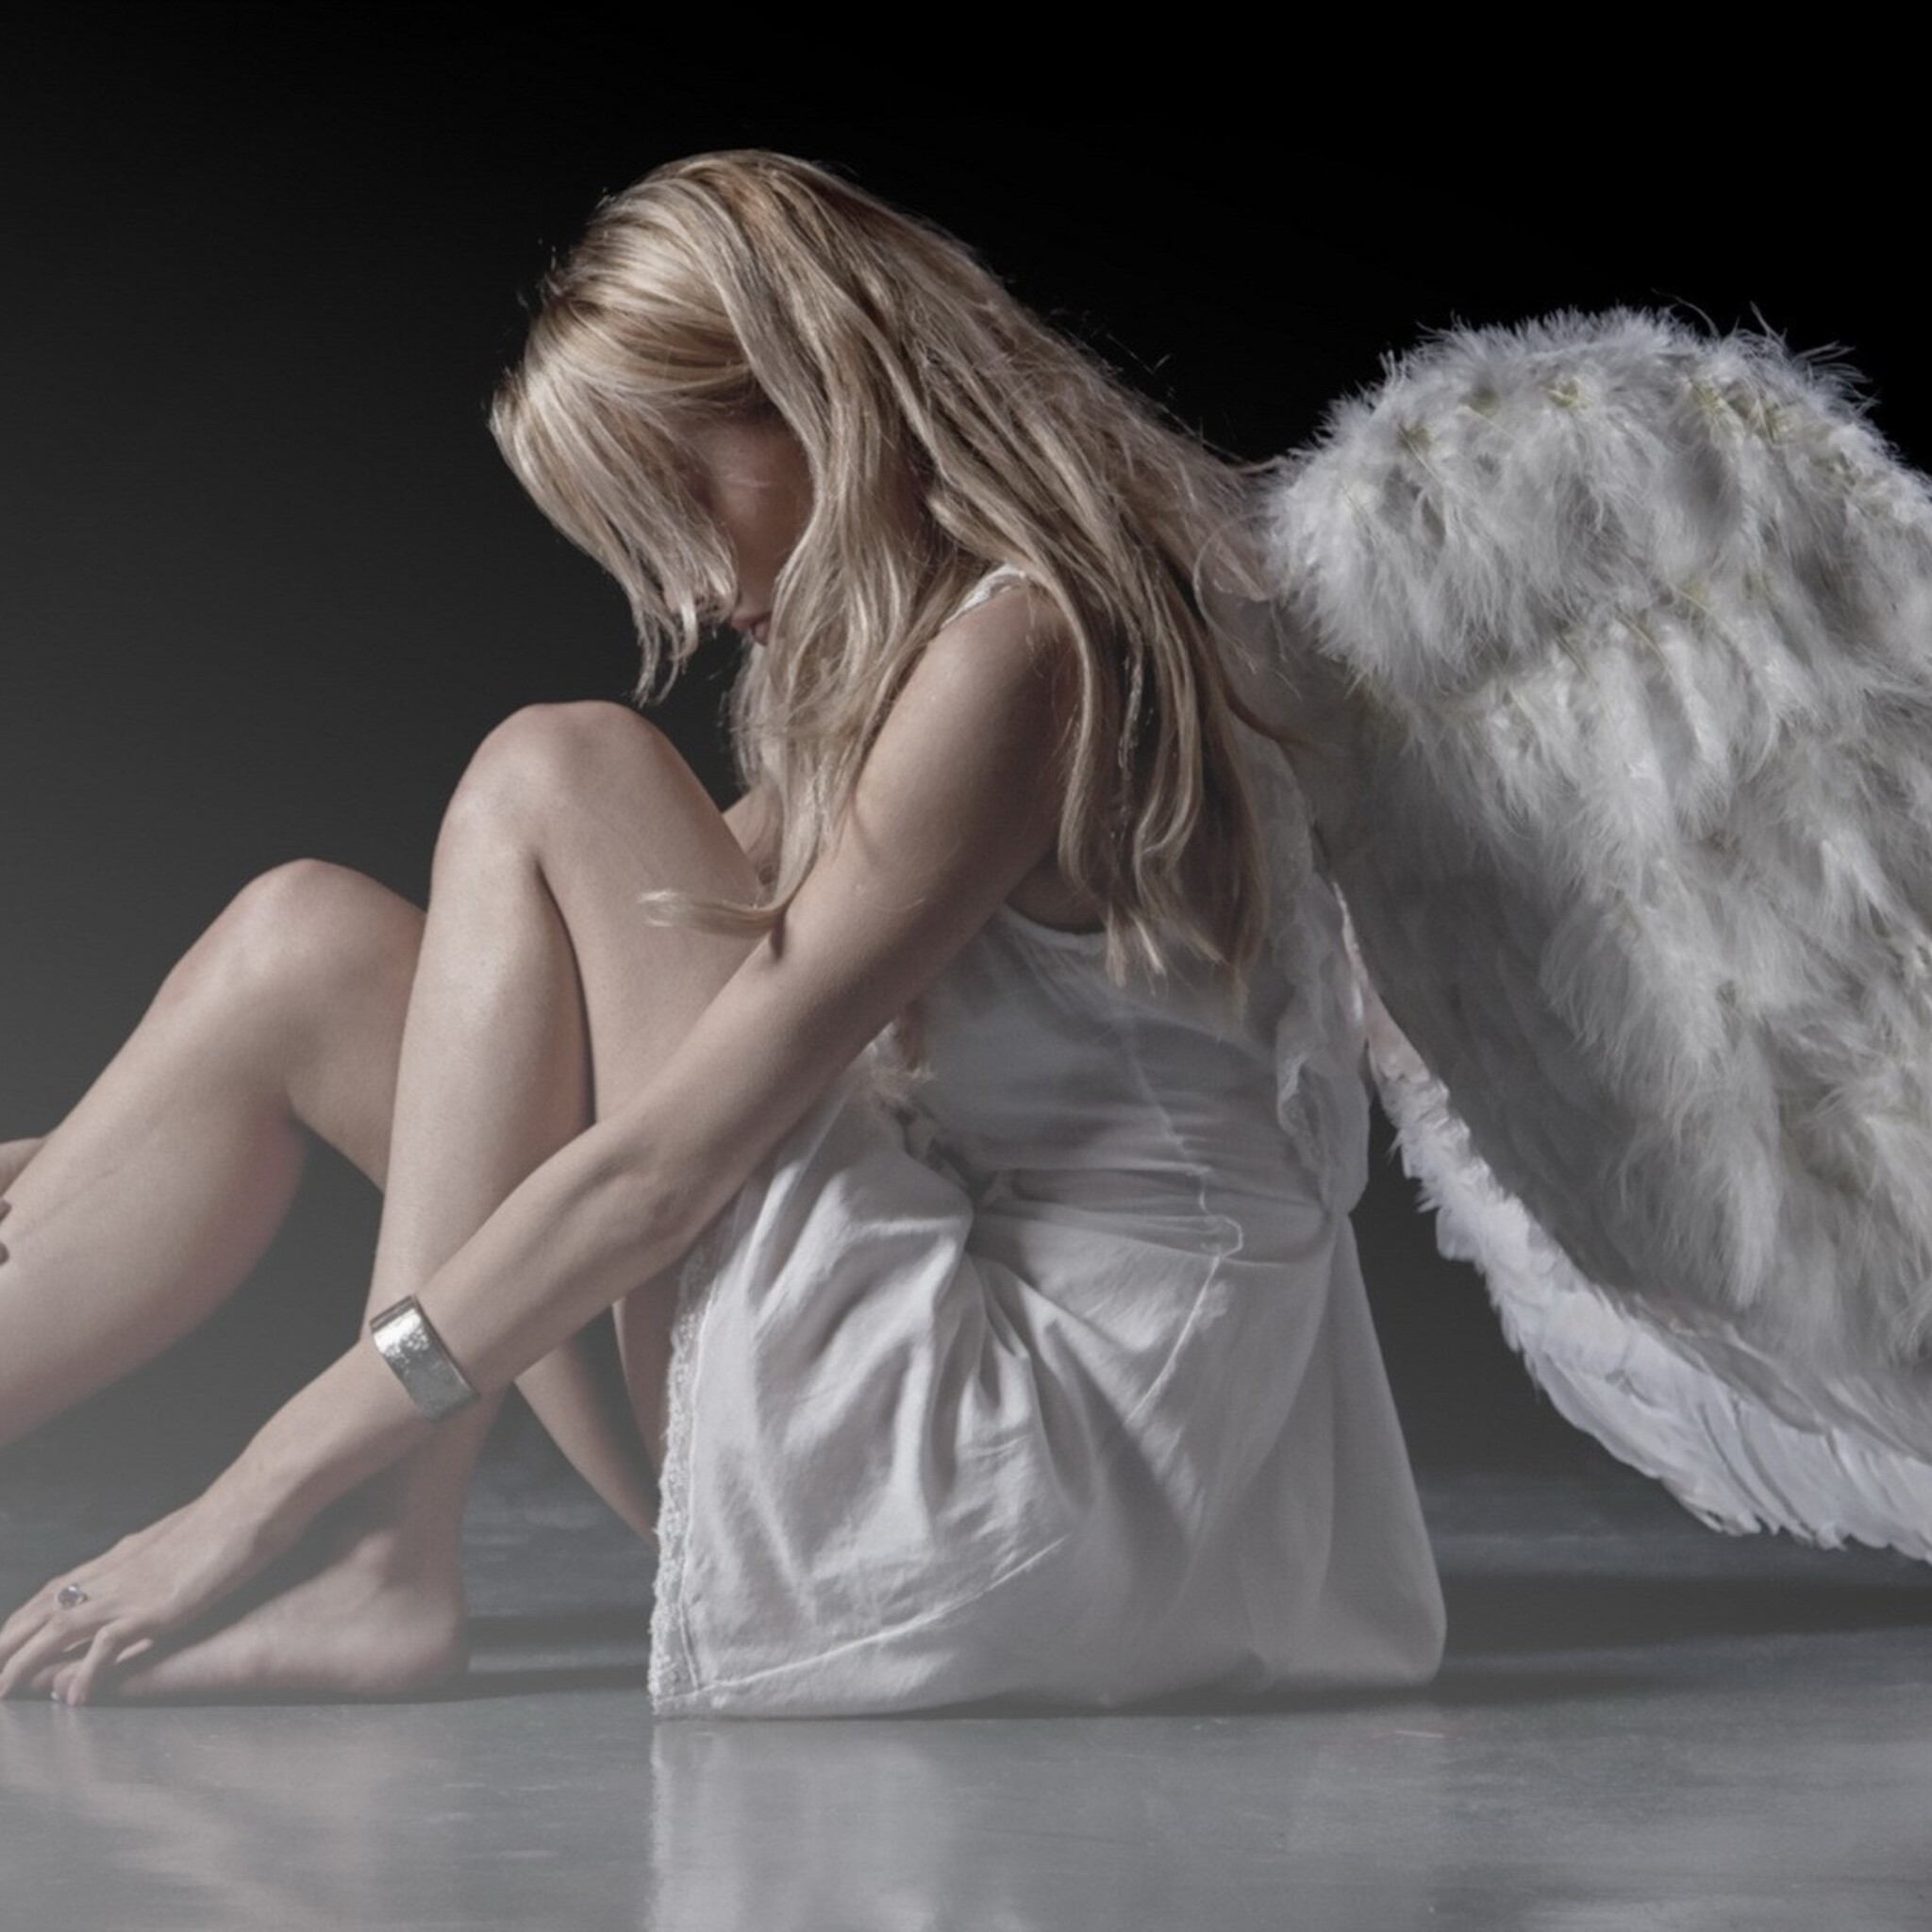 2048x2048 angel girl ipad air hd 4k wallpapers images - Angel girl wallpaper ...